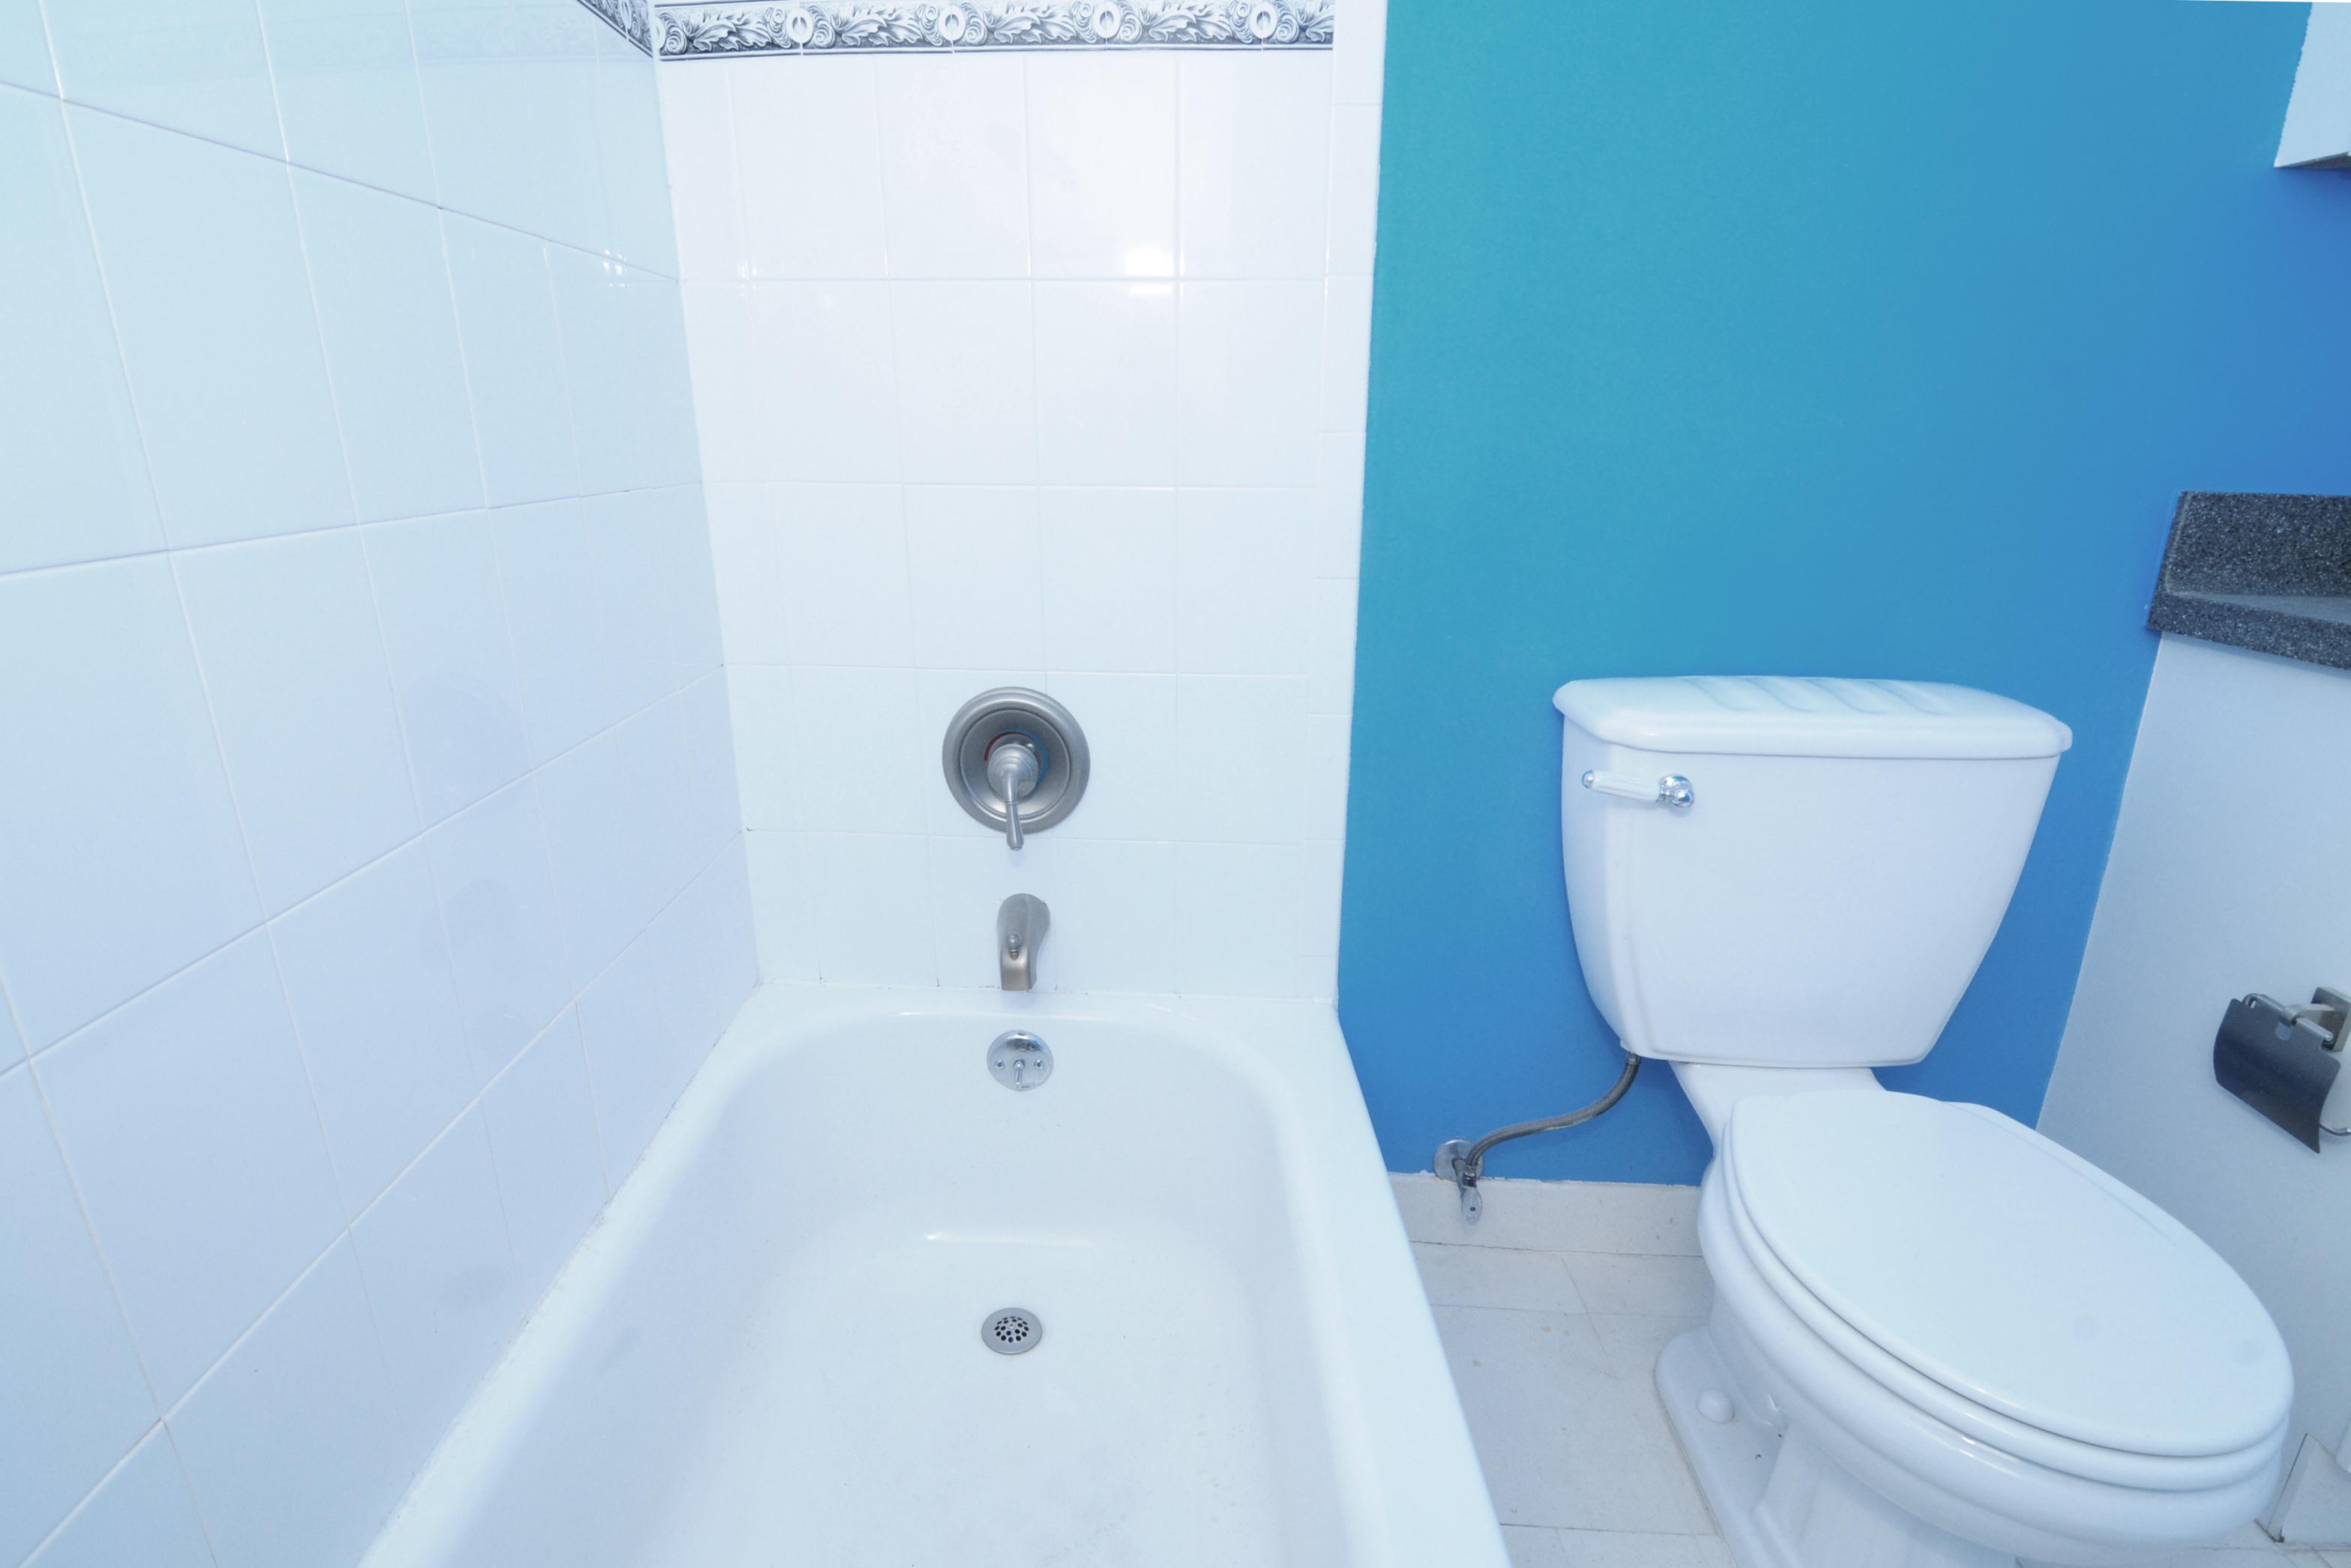 Bath-TubToilet_low01 – The Apartments at 31-81